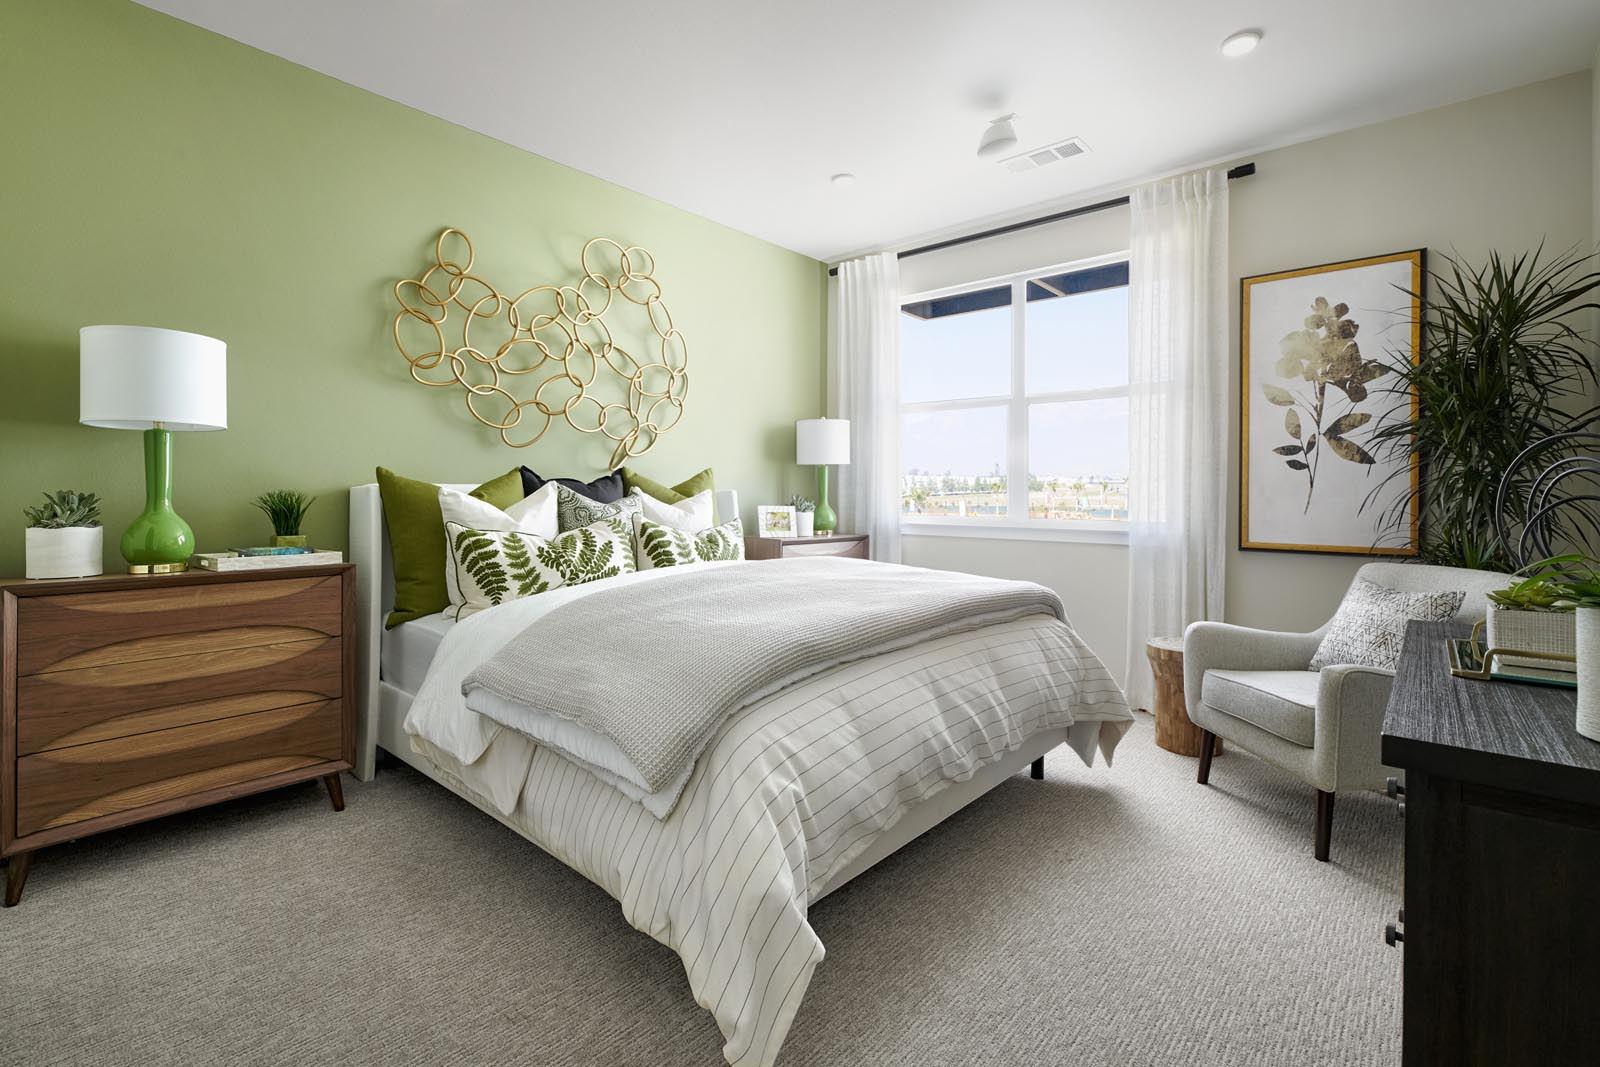 Master Bedroom   Residence 3   Enliven   New Homes in Rancho Cucamonga, CA   Van Daele Homes